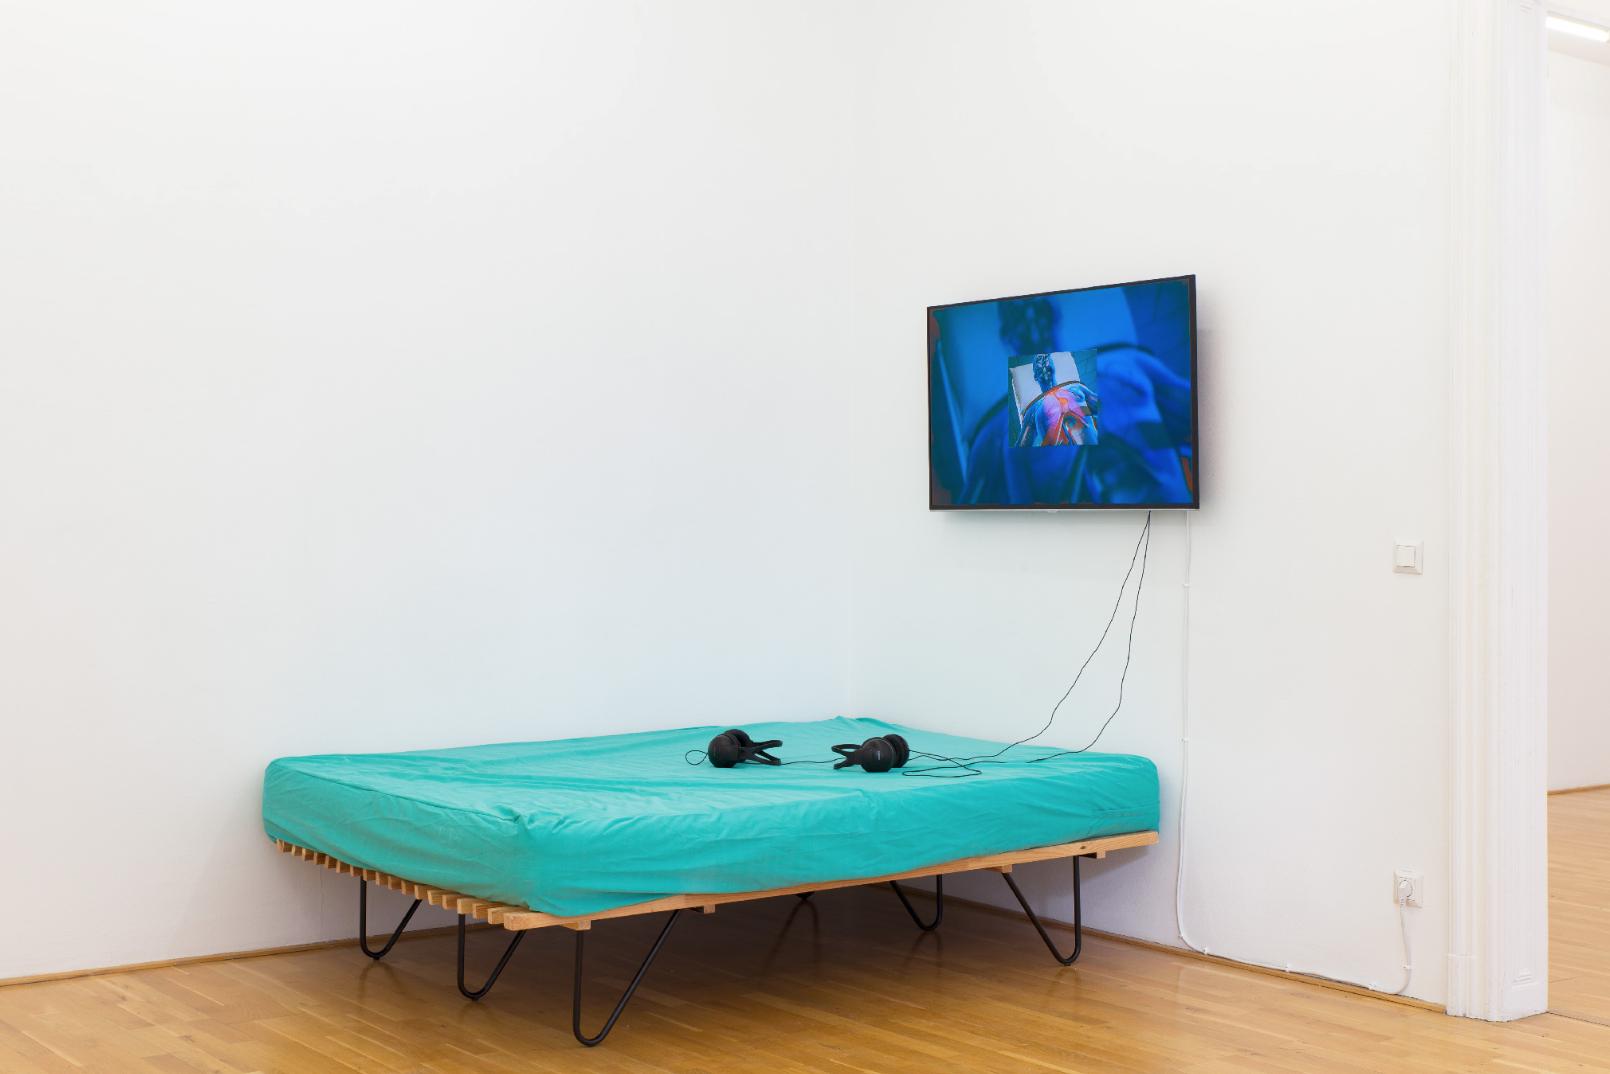 curated by_Rózsa Zita Farkas, Sidsel Meineche Hansen - exhibition view, Galerie Andreas Huber, Vienna, 11.9.20151. – 7.11.2015, Photo: Stefan Lux